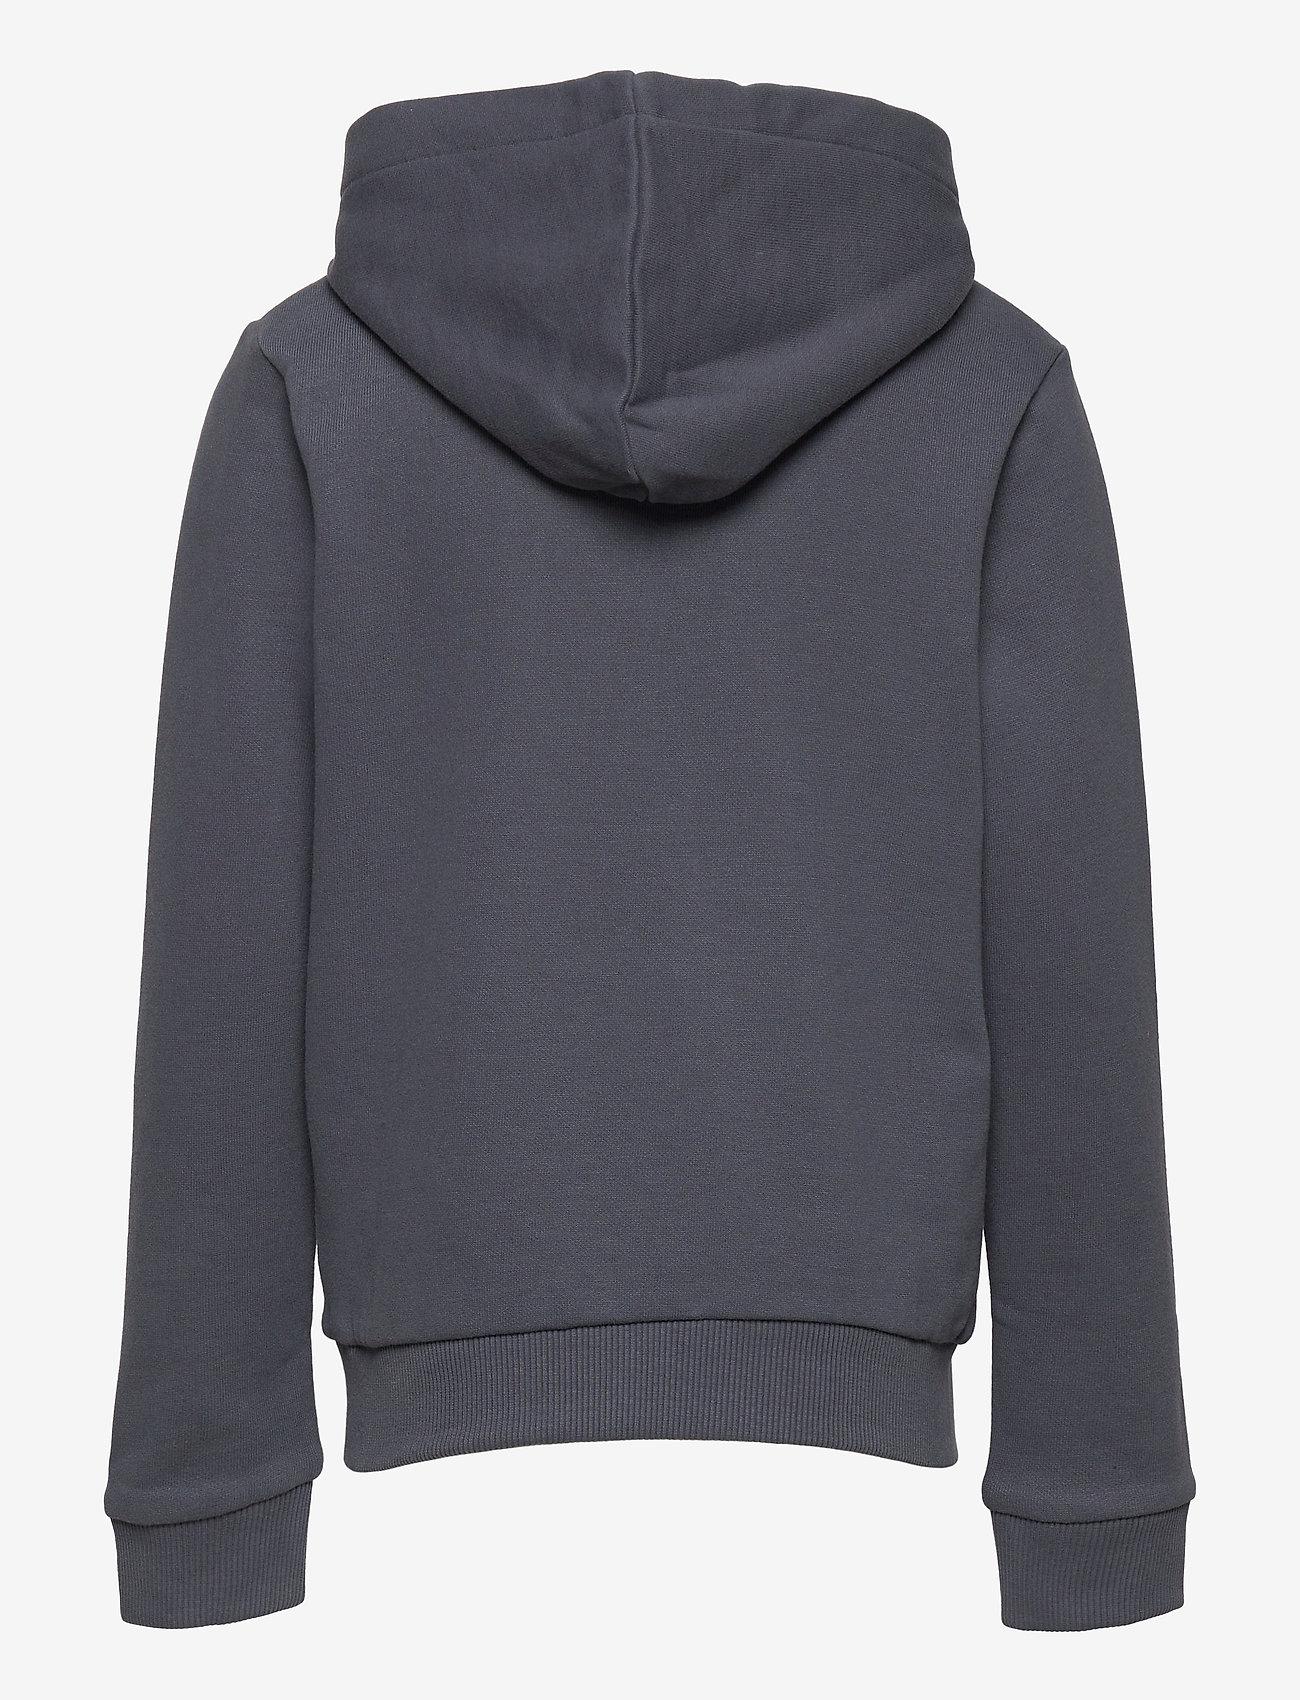 Timberland - HOODED SWEATSHIRT - kapuzenpullover - medium grey - 1